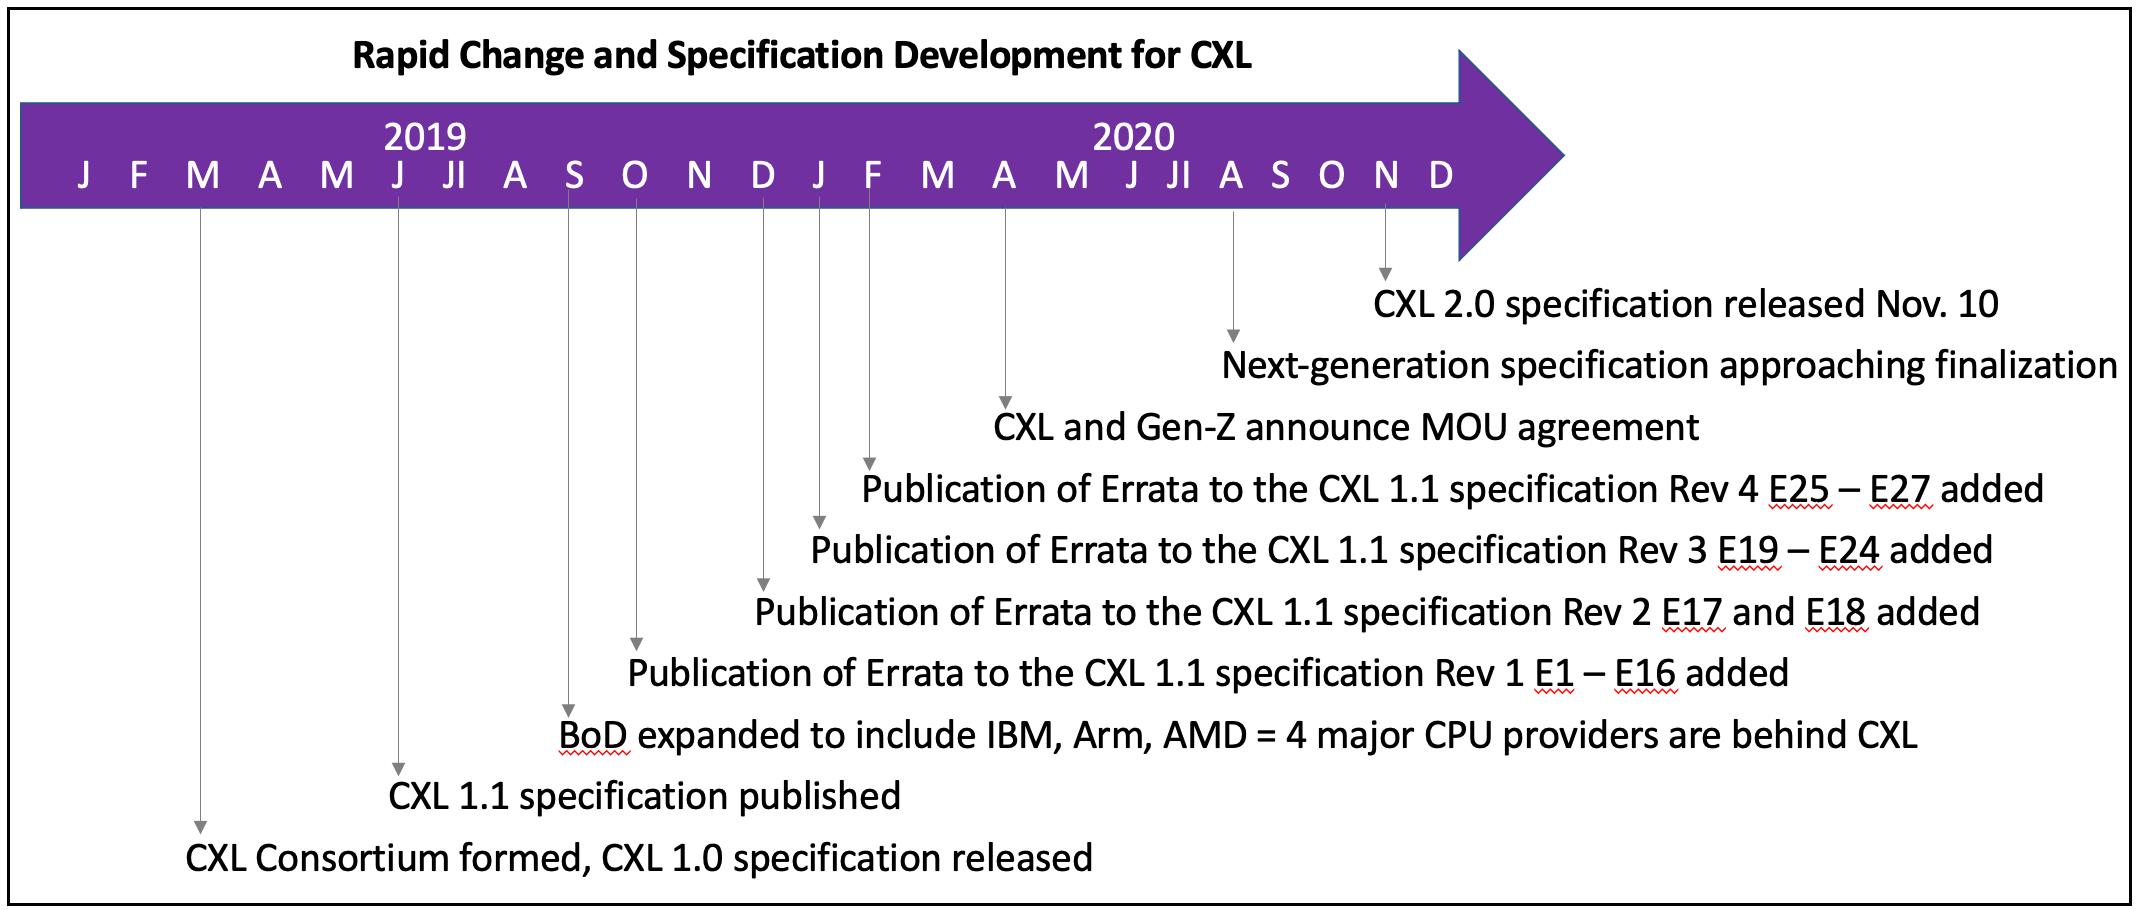 CXLs busy timeline